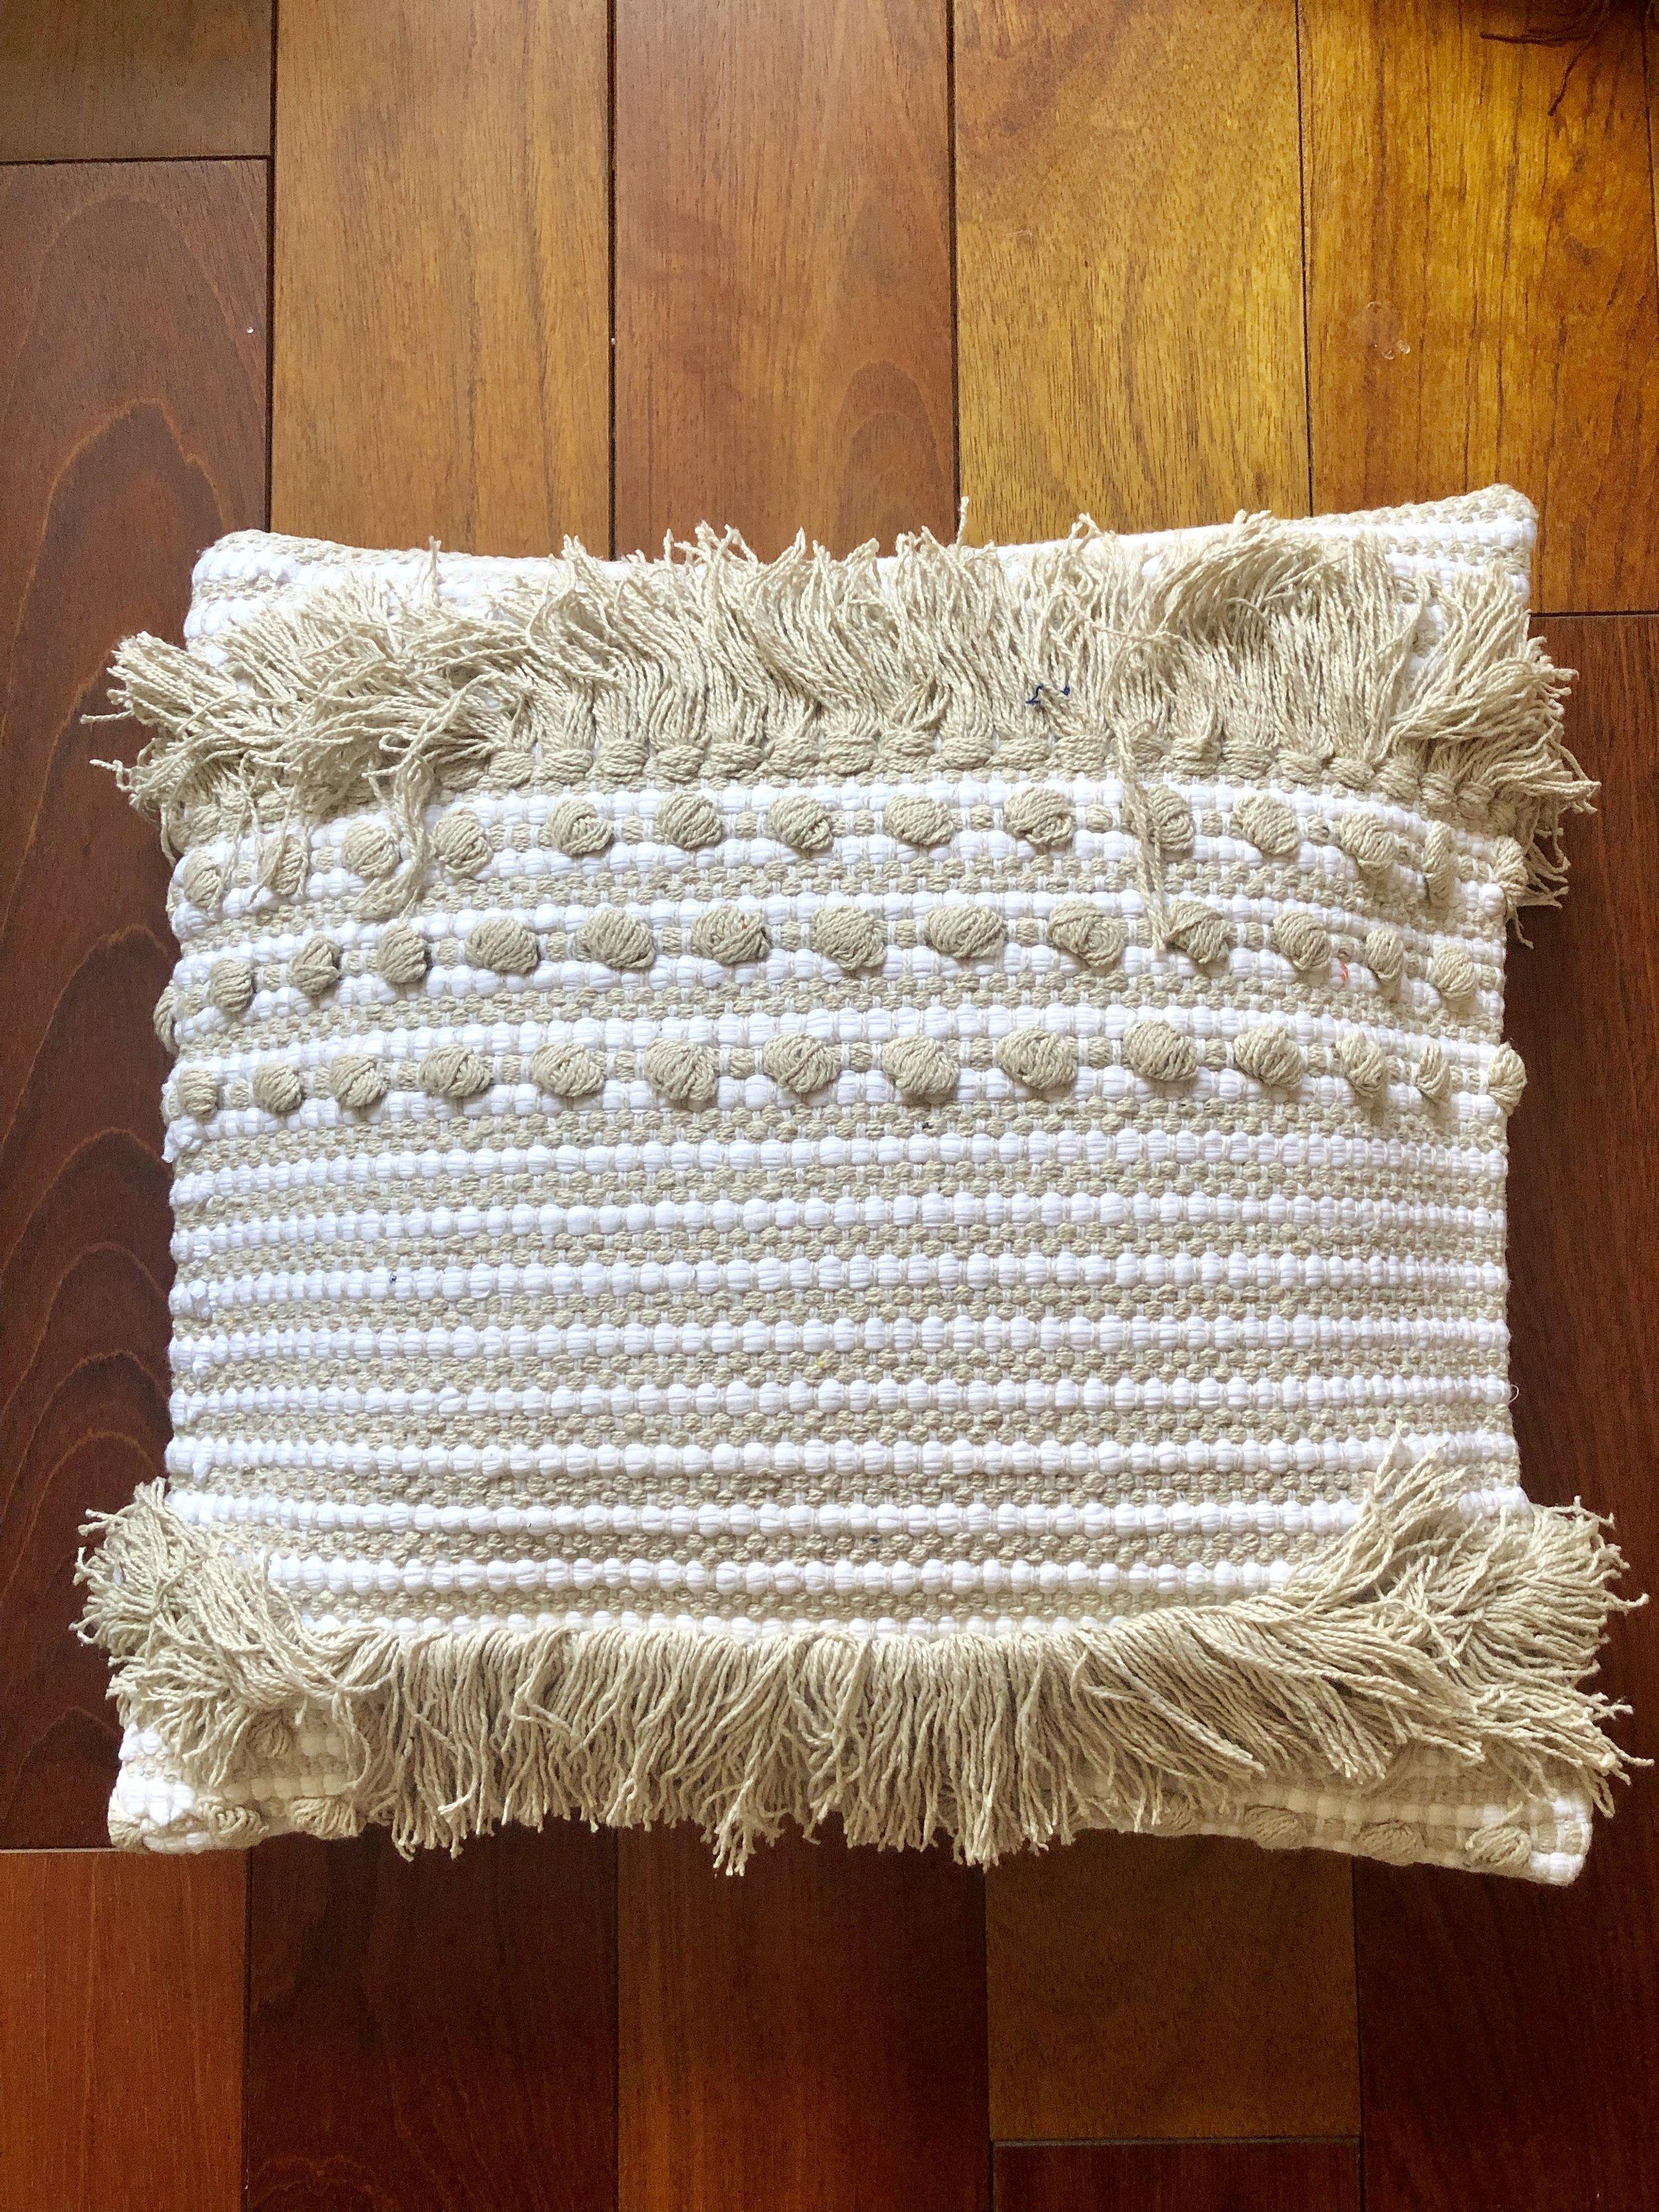 Boho Pillow Voleri /#048 / $10